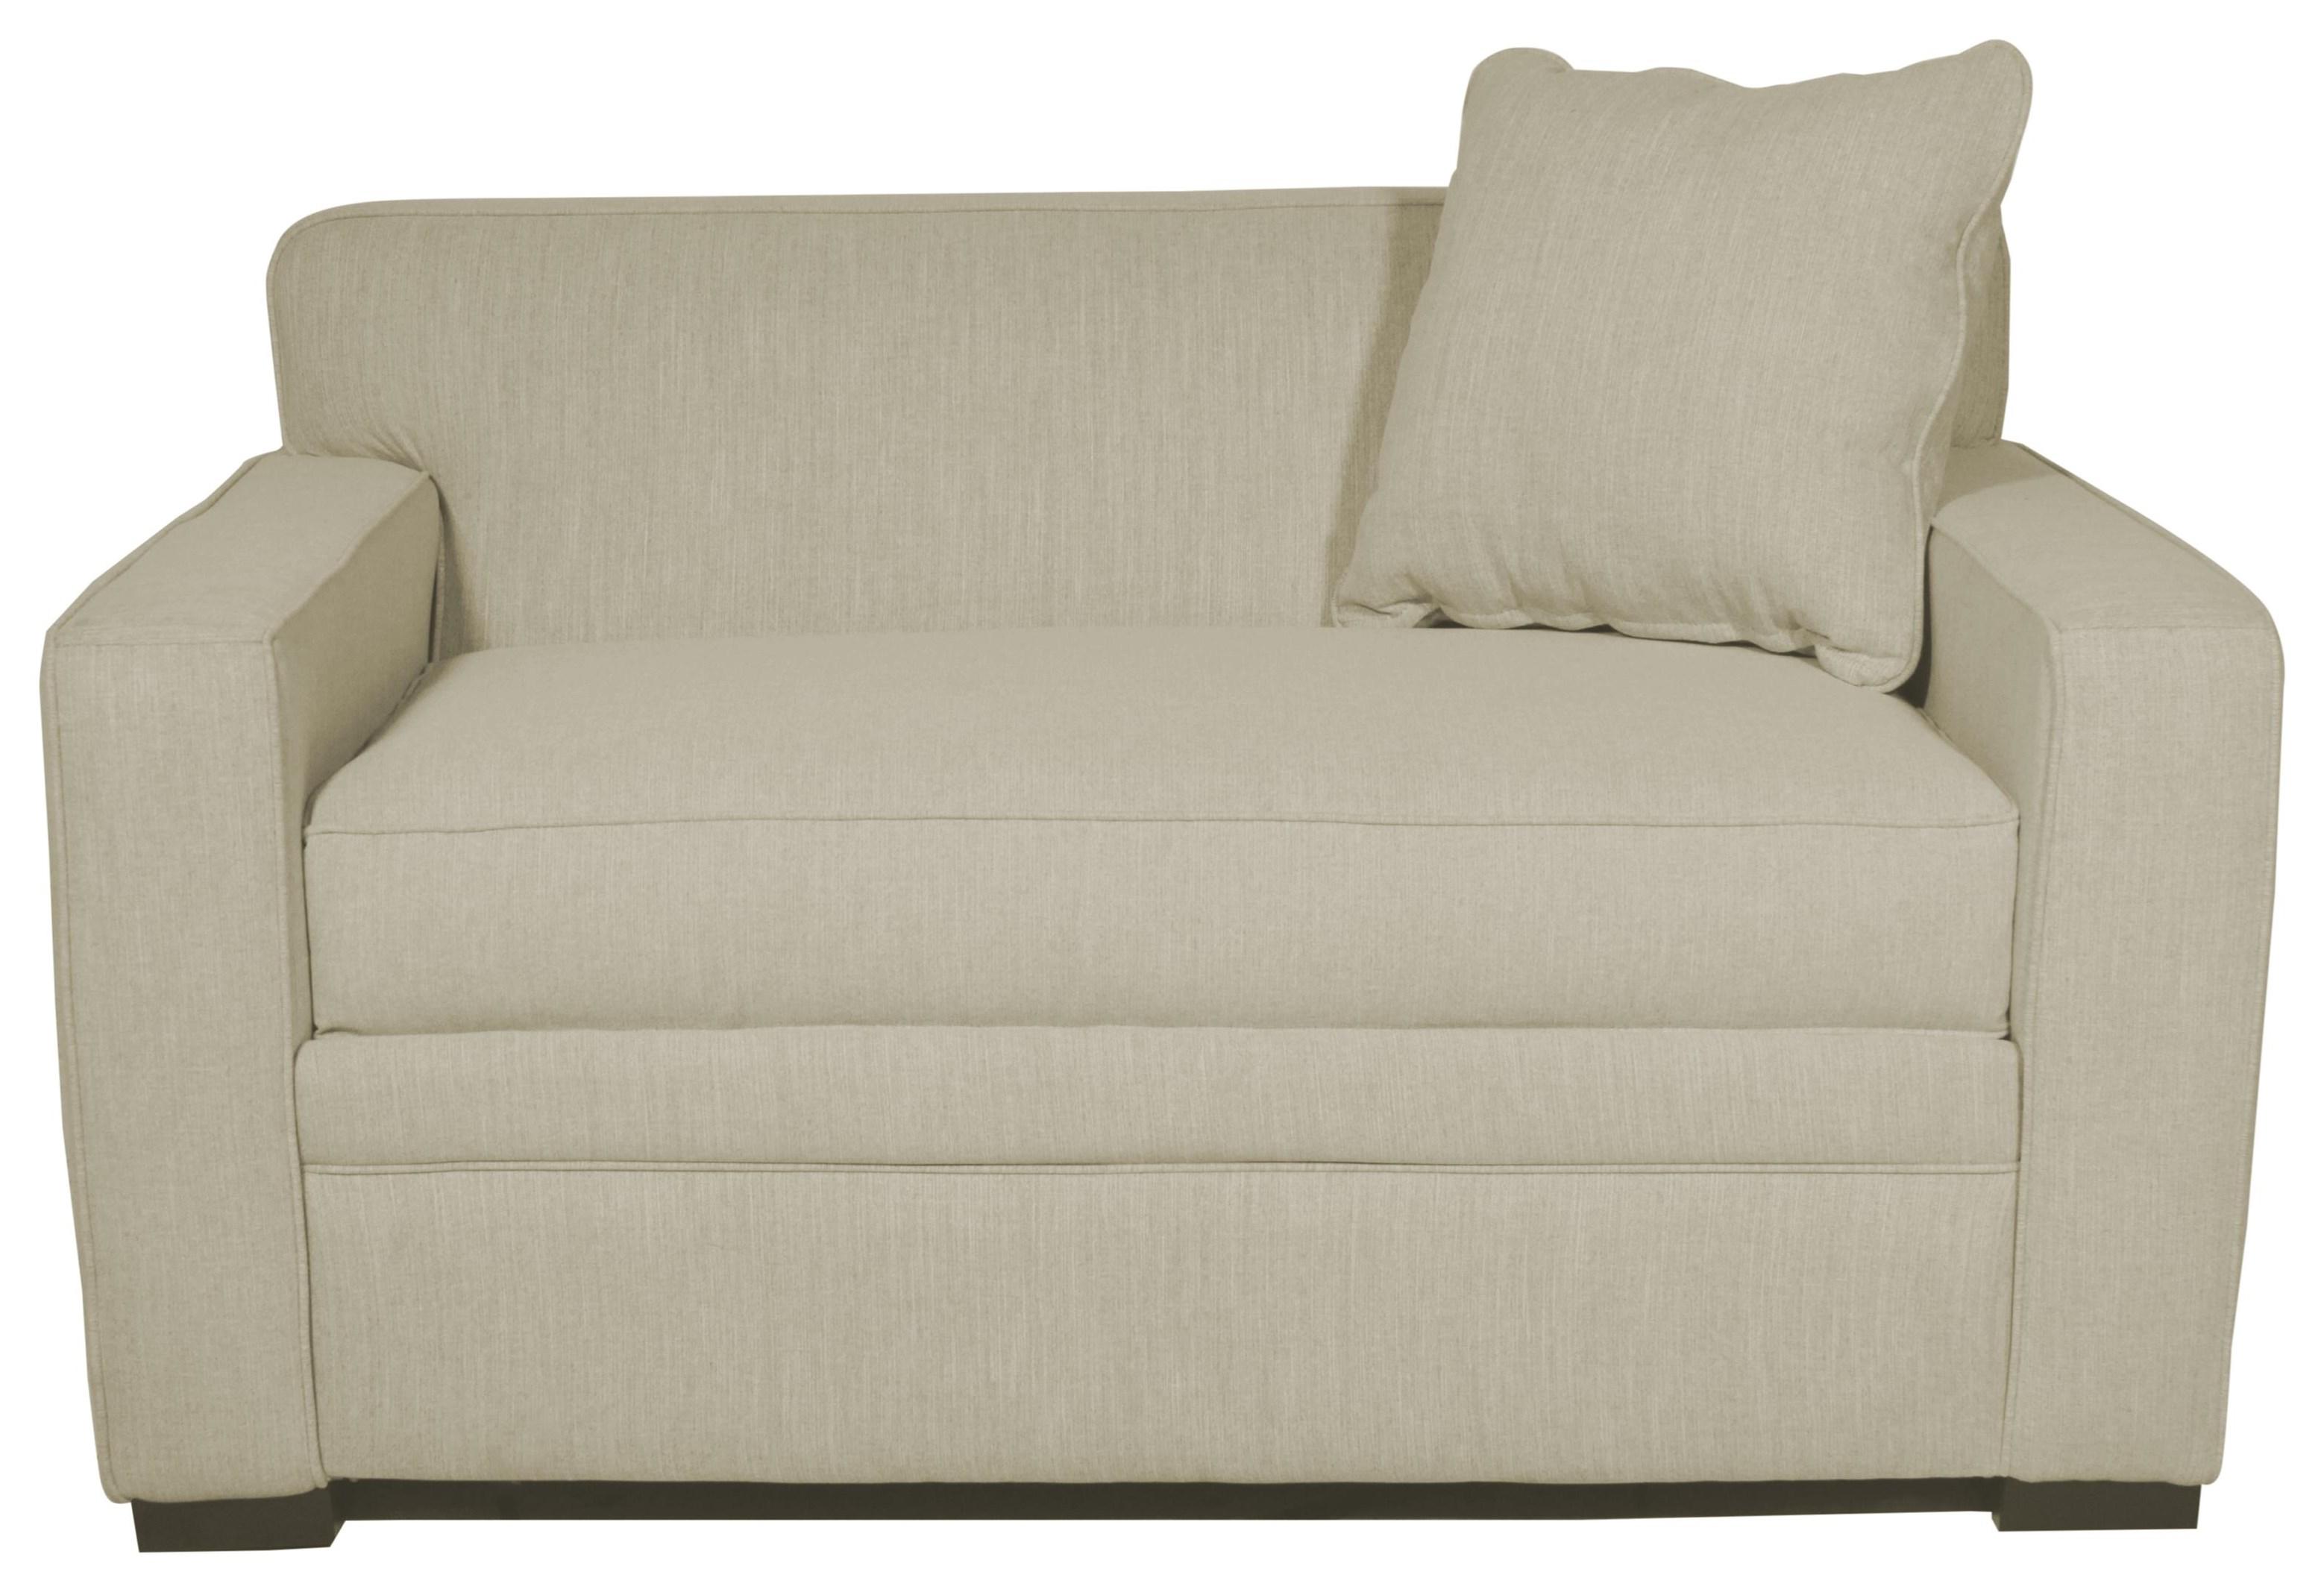 Sleepy Twin Sleeper Chair by Jonathan Louis at HomeWorld Furniture